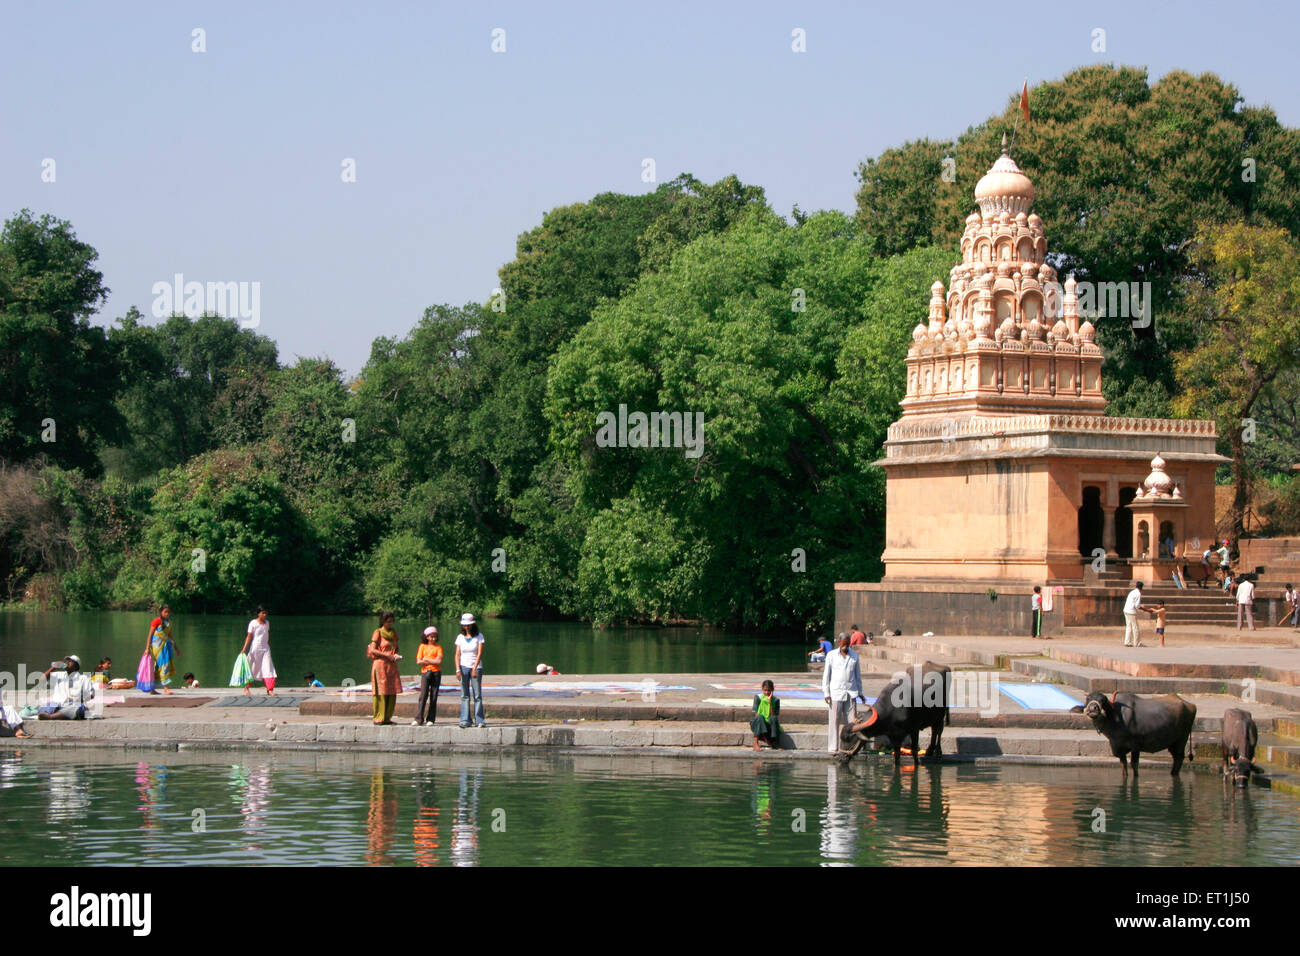 Temple dedicated to lord Shiva on banks of river Krishna ; Menauli ; Wai ; Maharashtra ; India - Stock Image